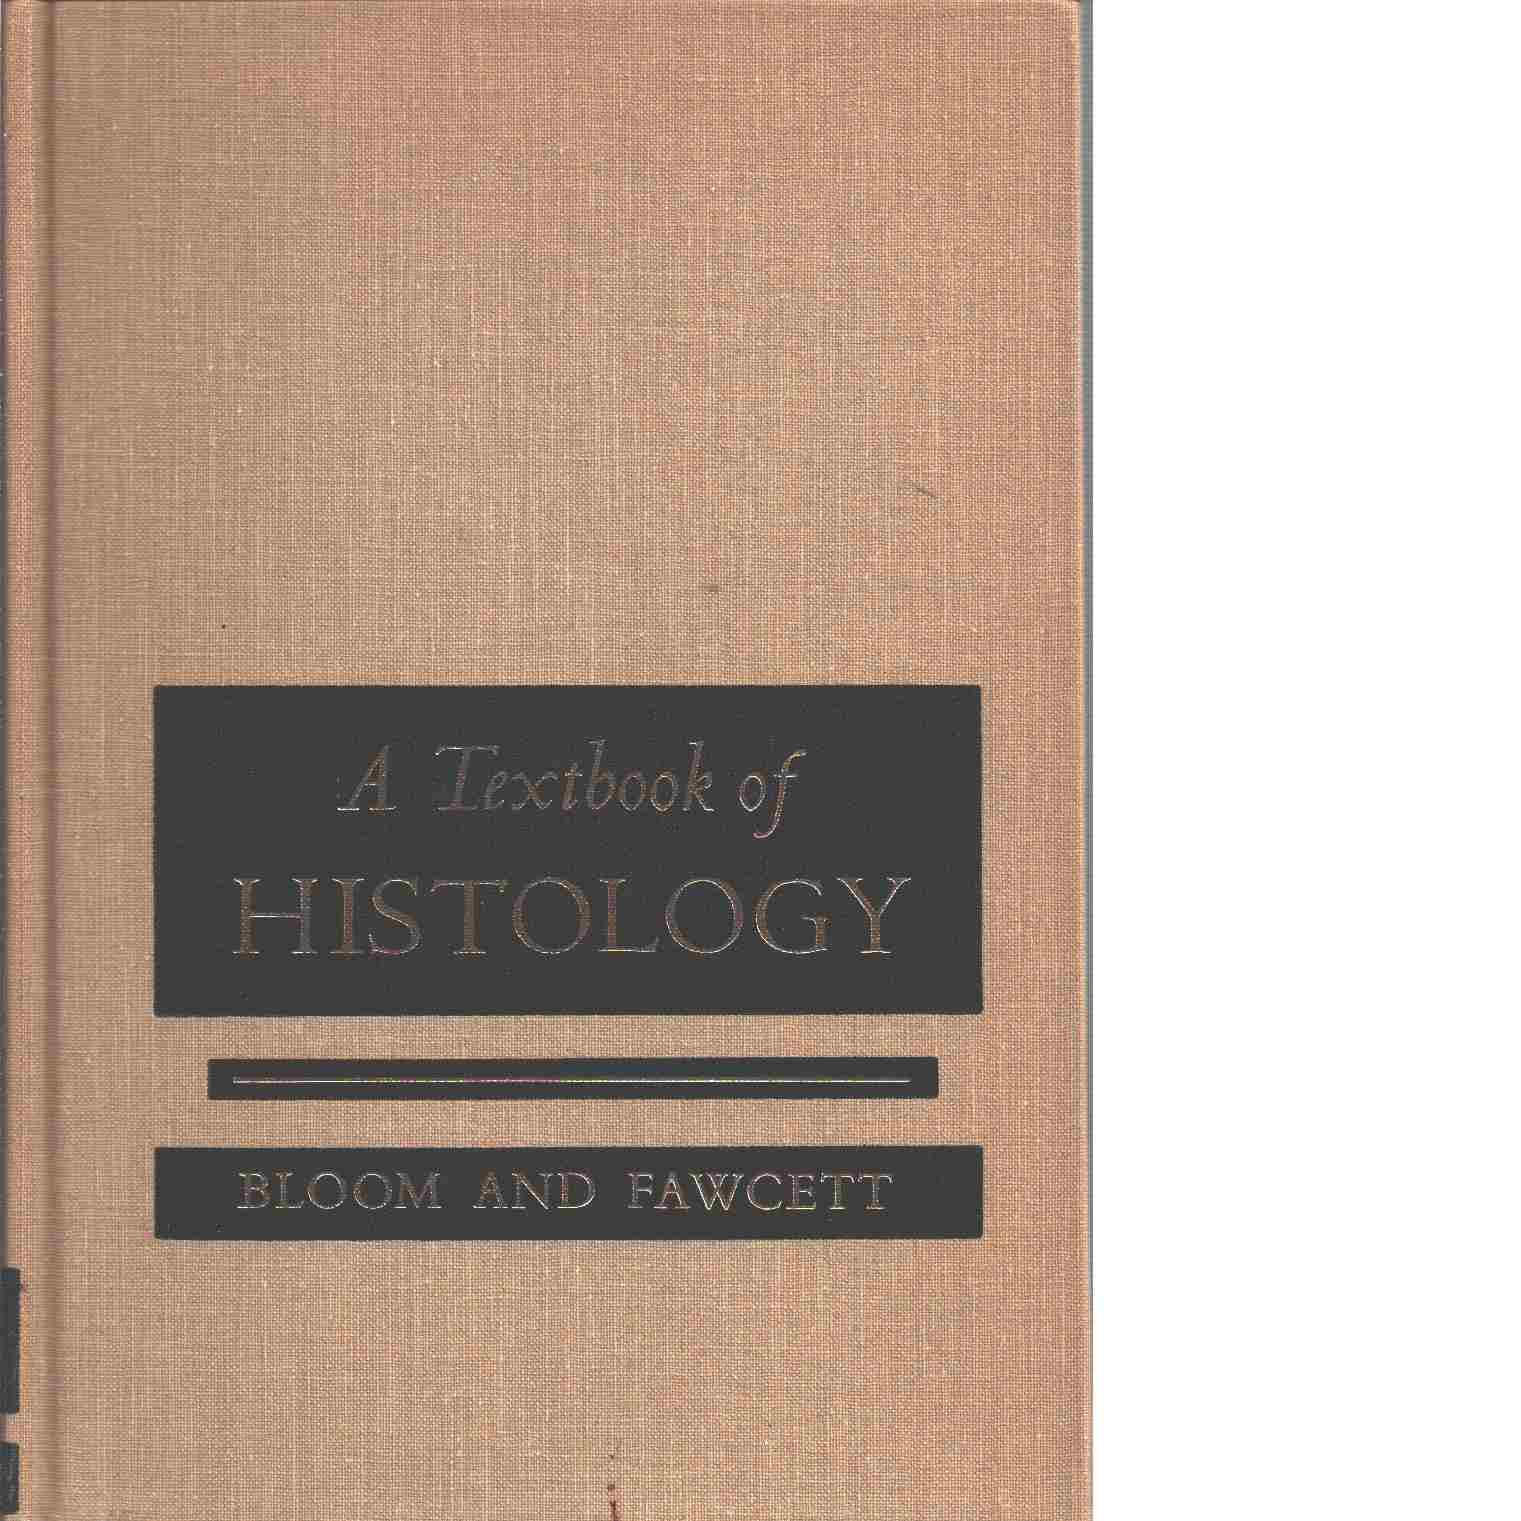 A textbook of histology - Bloom, William och Fawcett, Don W.